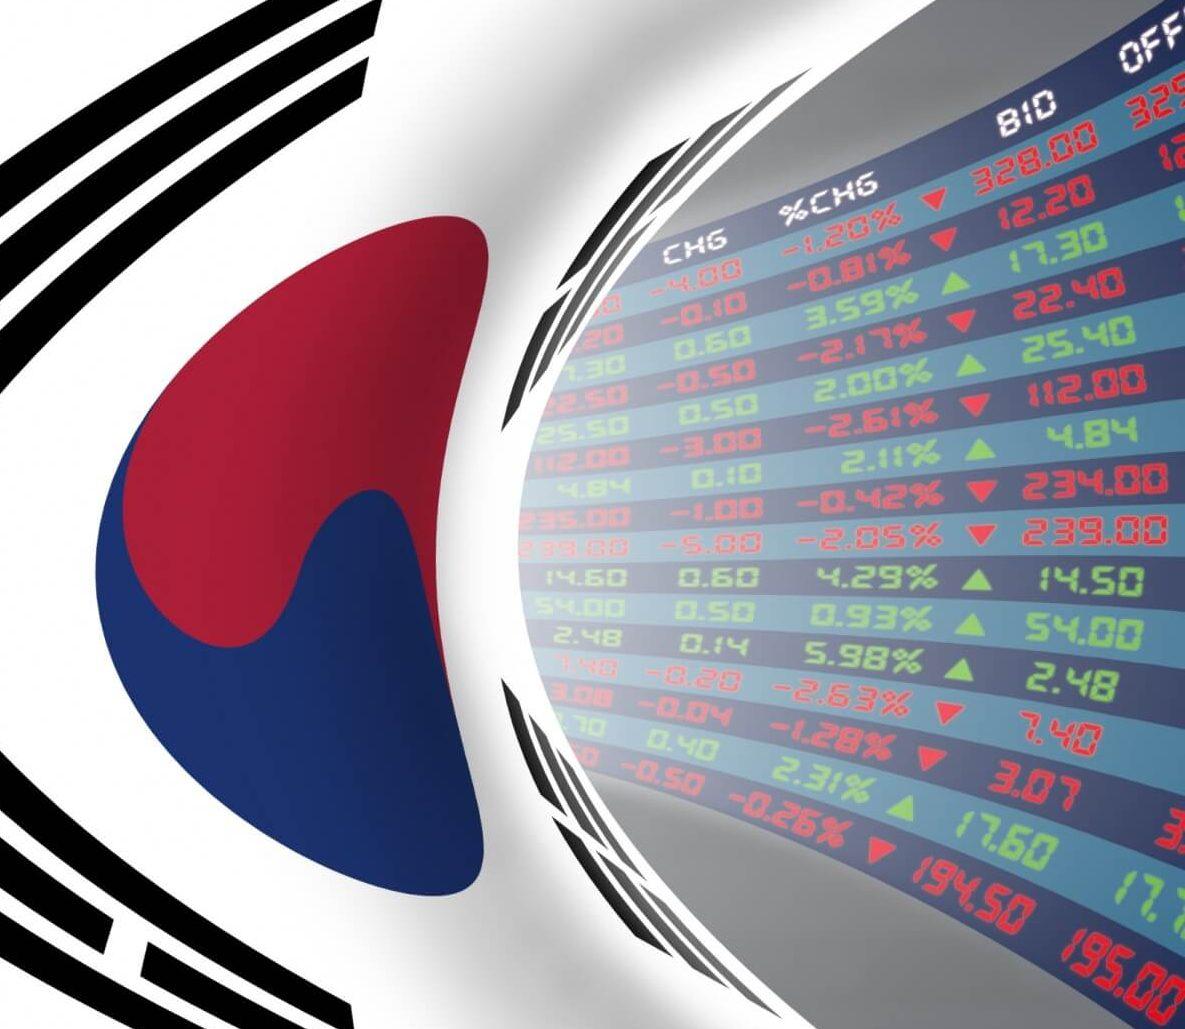 Регулятор Южной Кореи проверит три банка